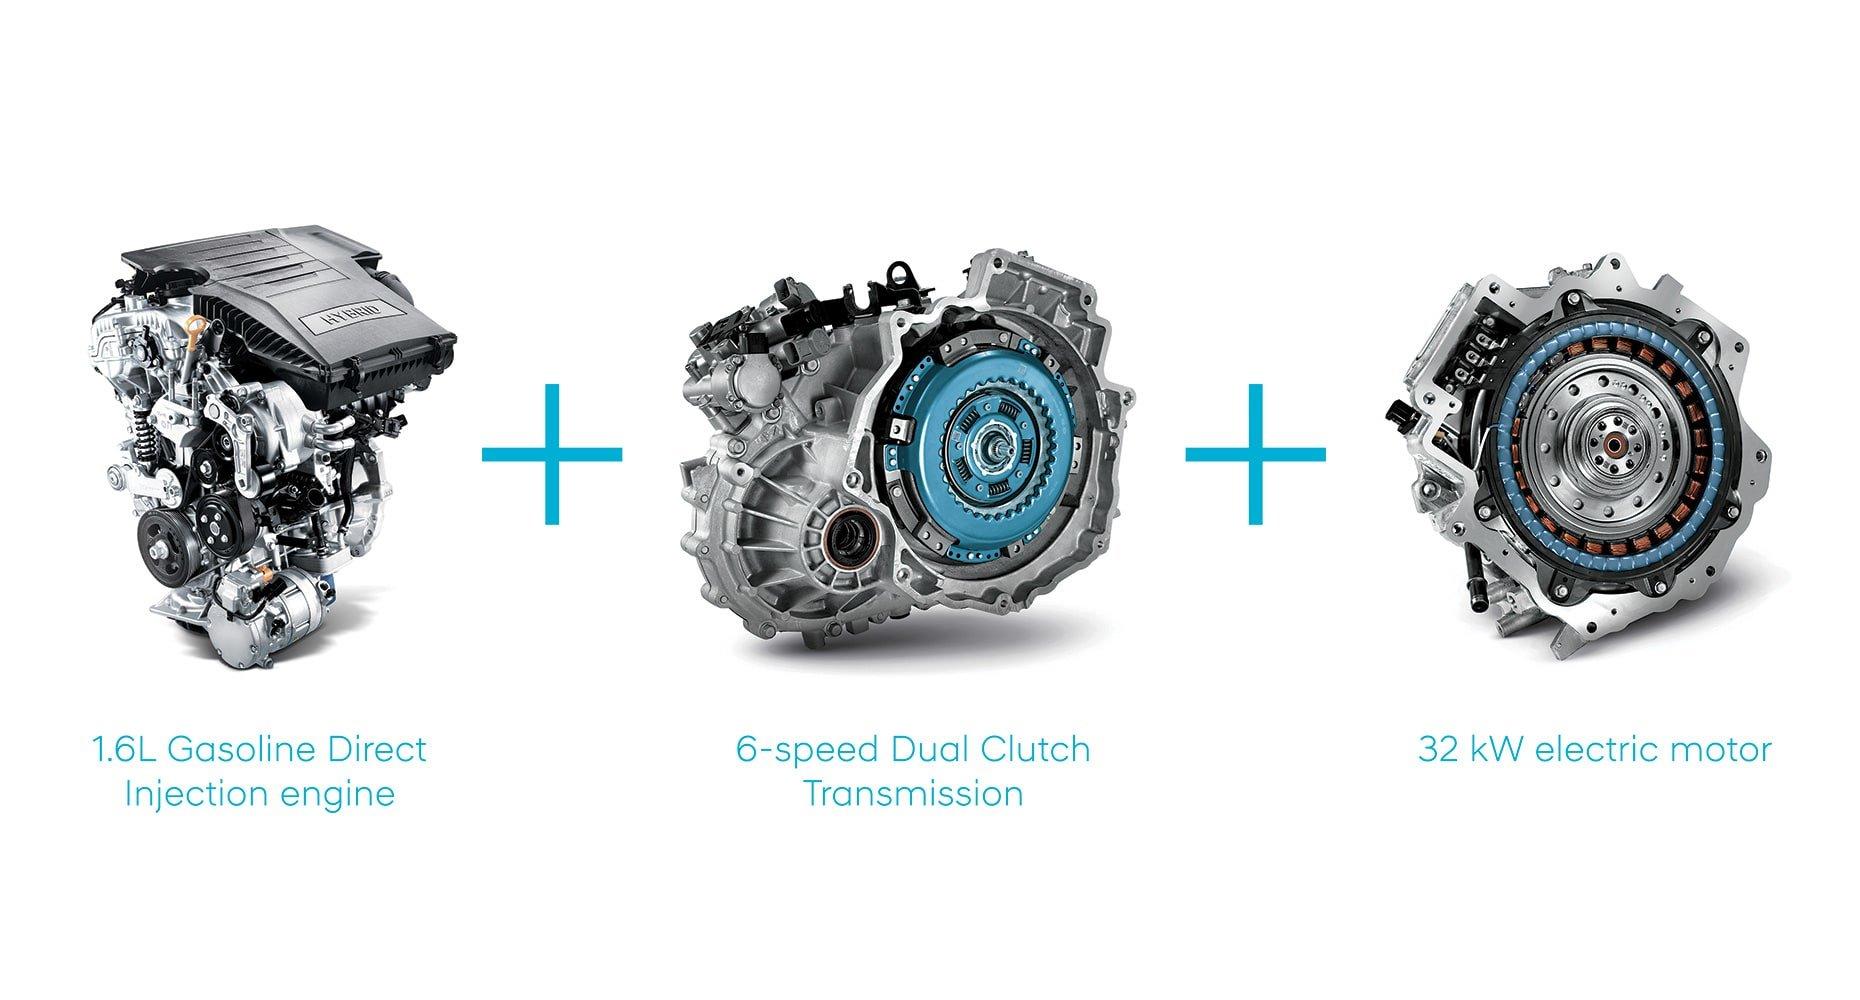 1.6L GDI engine